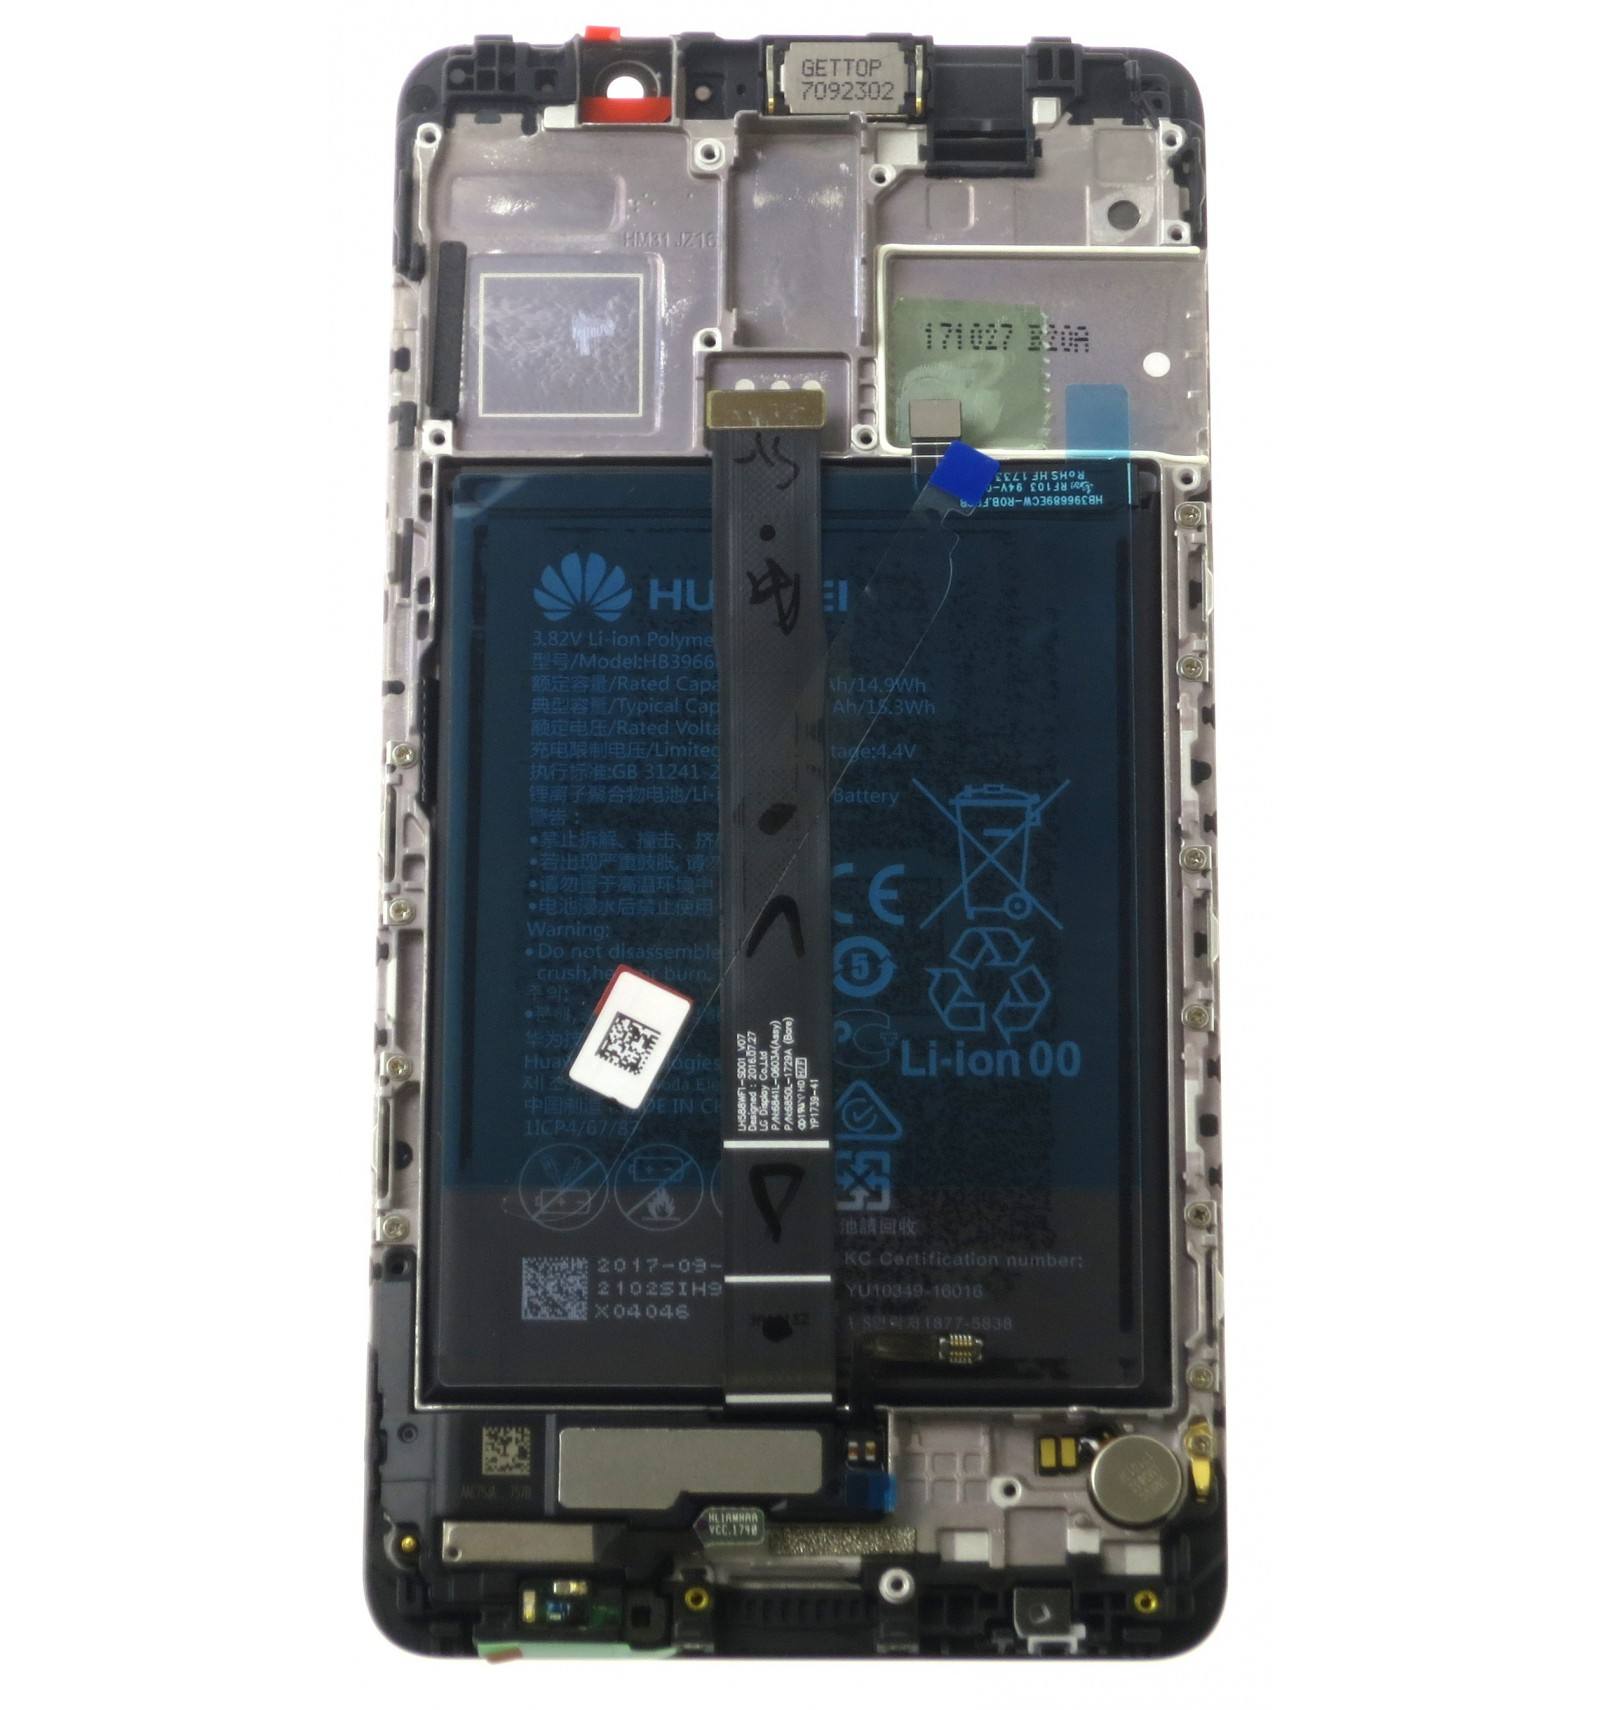 Lcd Touch Screen Frame Small Parts Black Original For Huawei Touchscreen Plus Xiaomi Redmi 3 3s 3x 3pro Mate 9